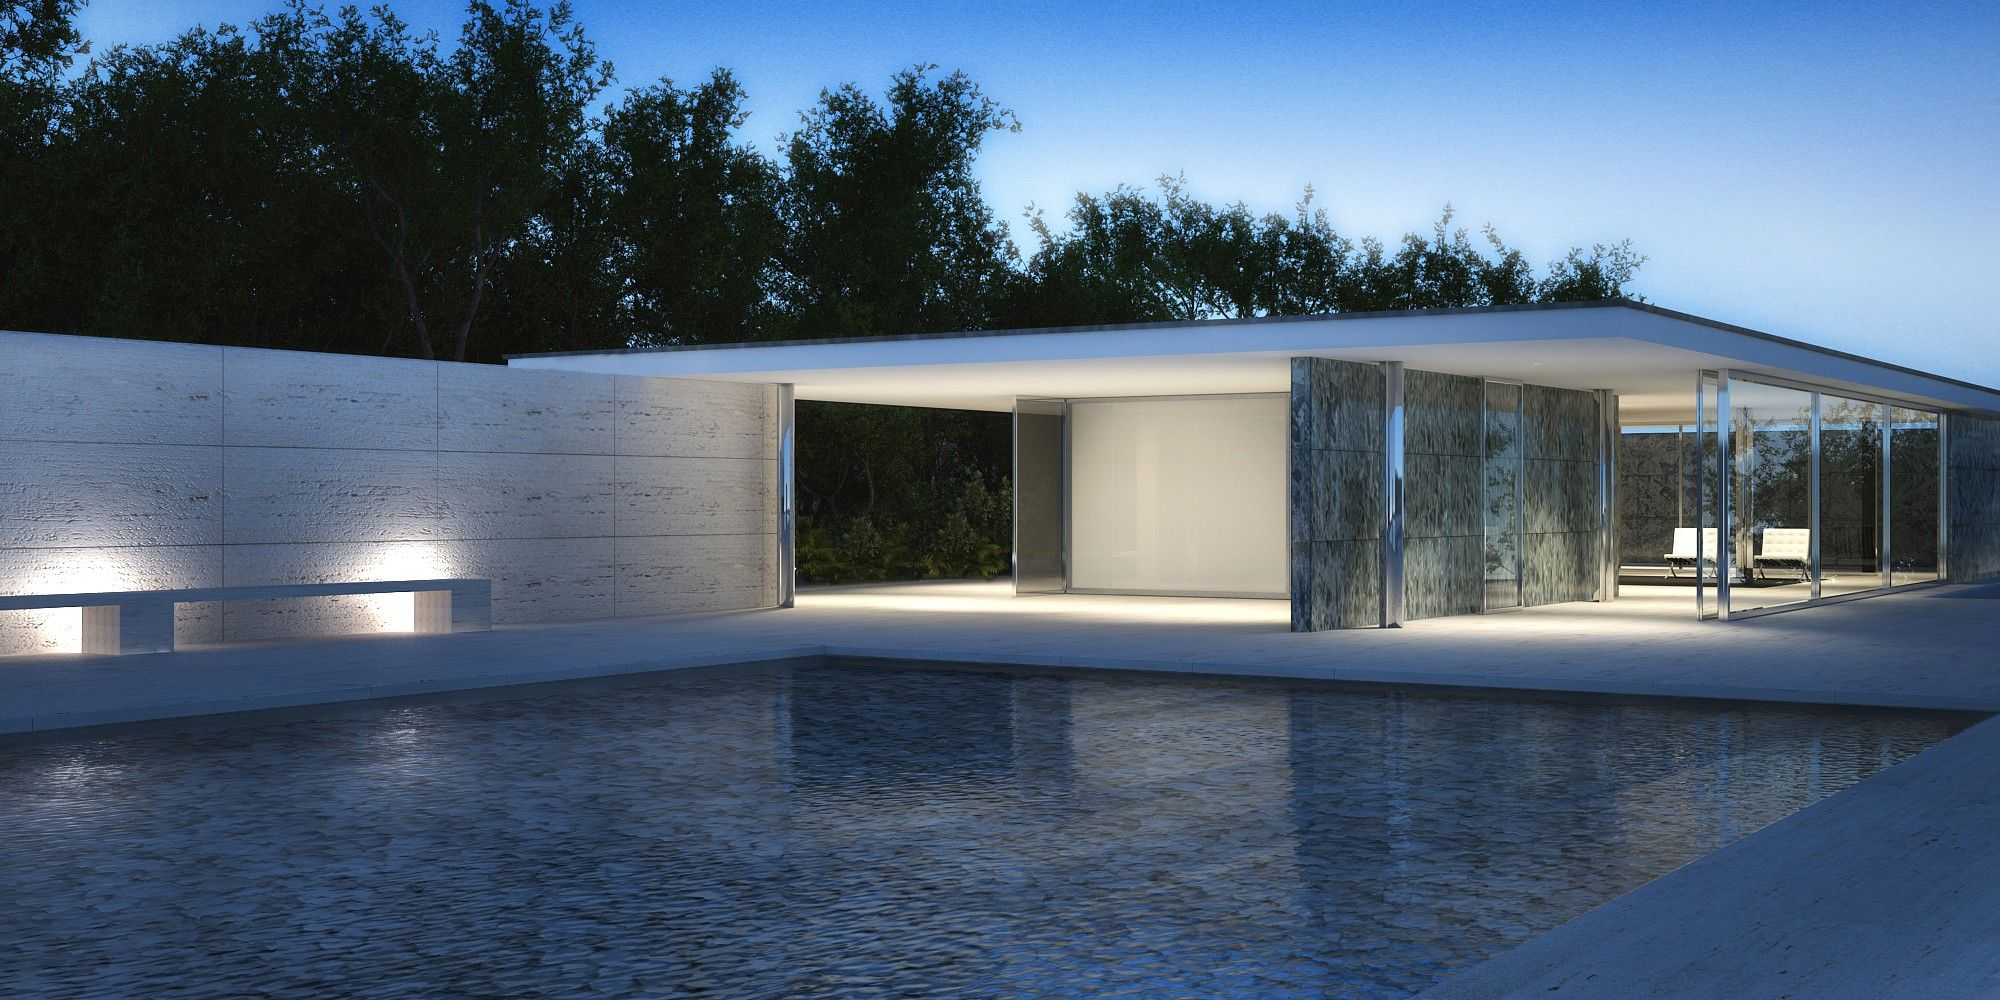 mies van der rohe barcelona pavilion architecture for non majors home spaces pinterest. Black Bedroom Furniture Sets. Home Design Ideas